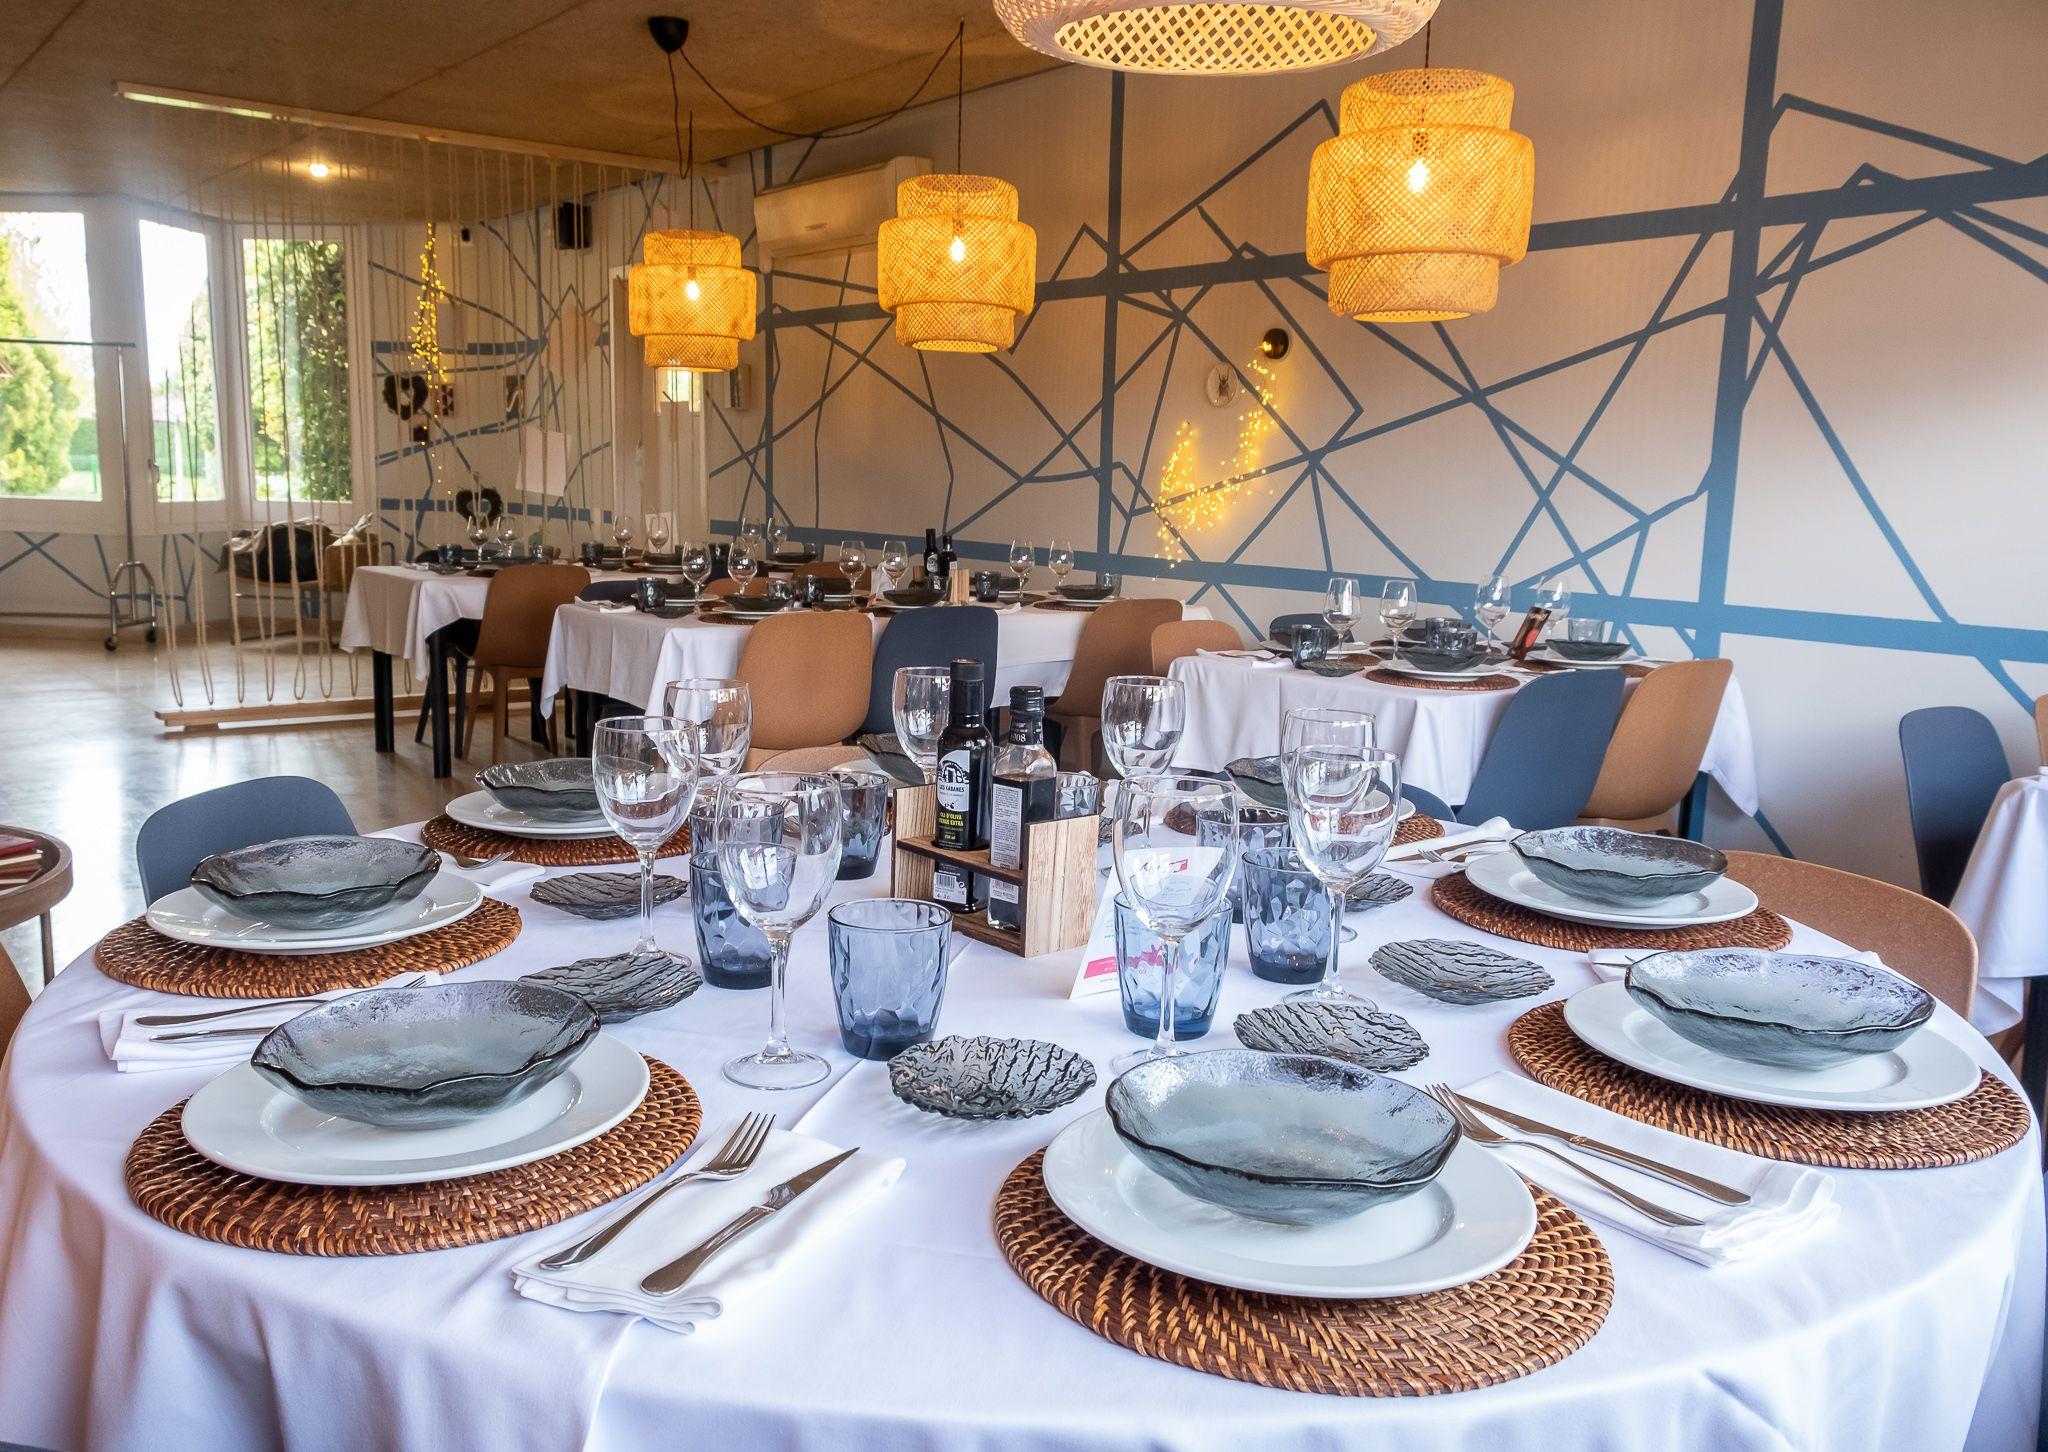 Restaurante comidas caseras para llevar Lleida